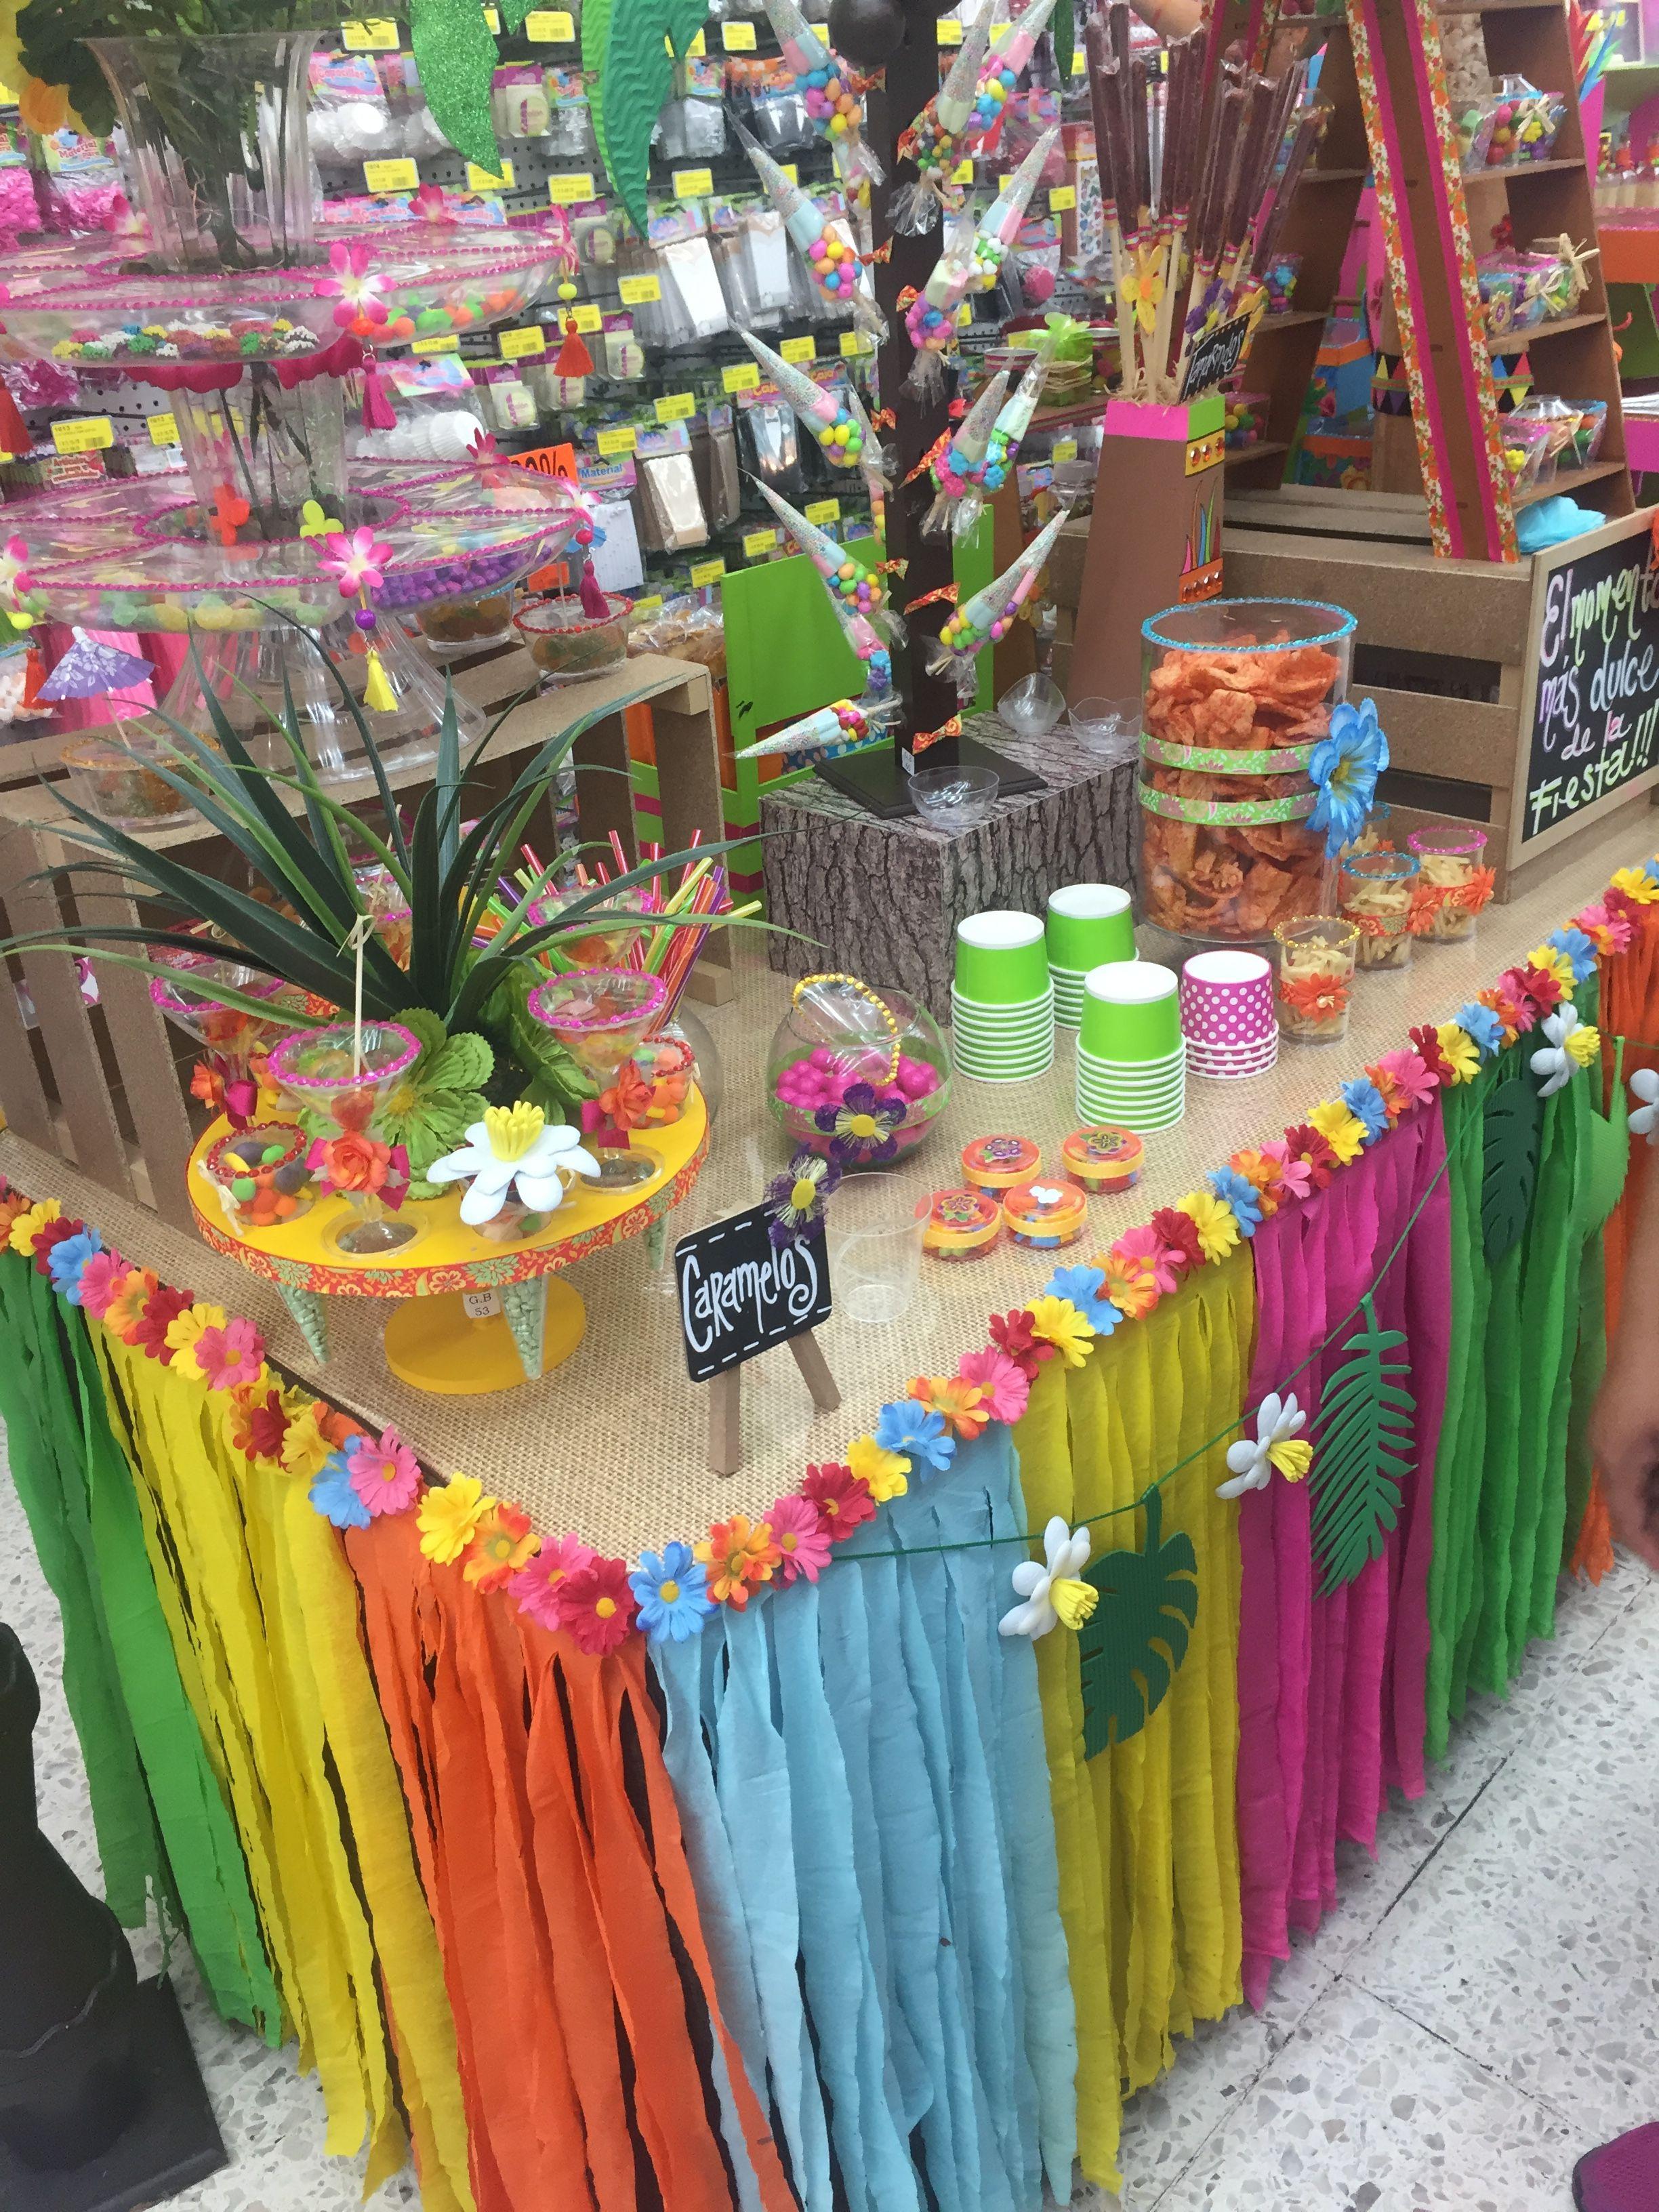 Pin de maria campillay en adorno para fiestas infantiles - Decoracion fiesta ibicenca casera ...